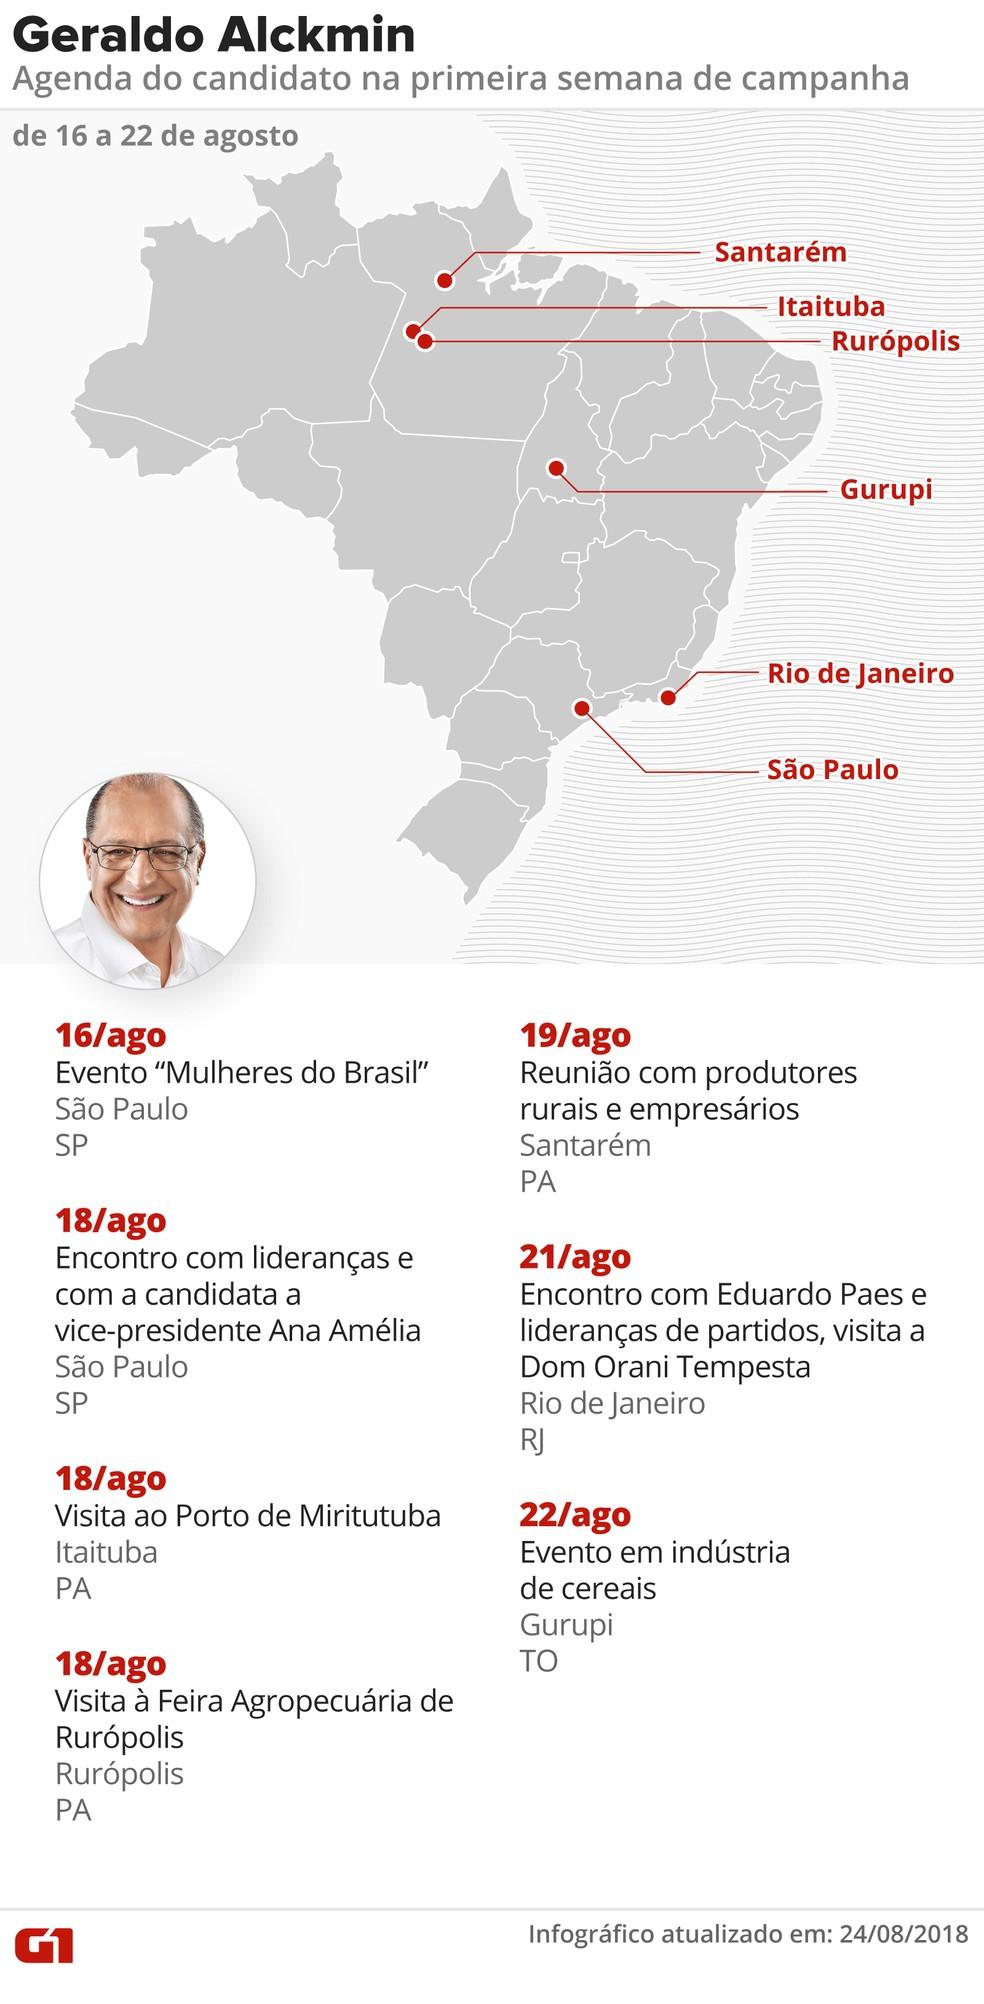 Agenda de Geraldo Alckmin (PSDB) na primeira semana de campanha presidencial (Foto: Alexandre Mauro, Roberta Jaworski, Igor Estrella e Juliane Souza/G1)